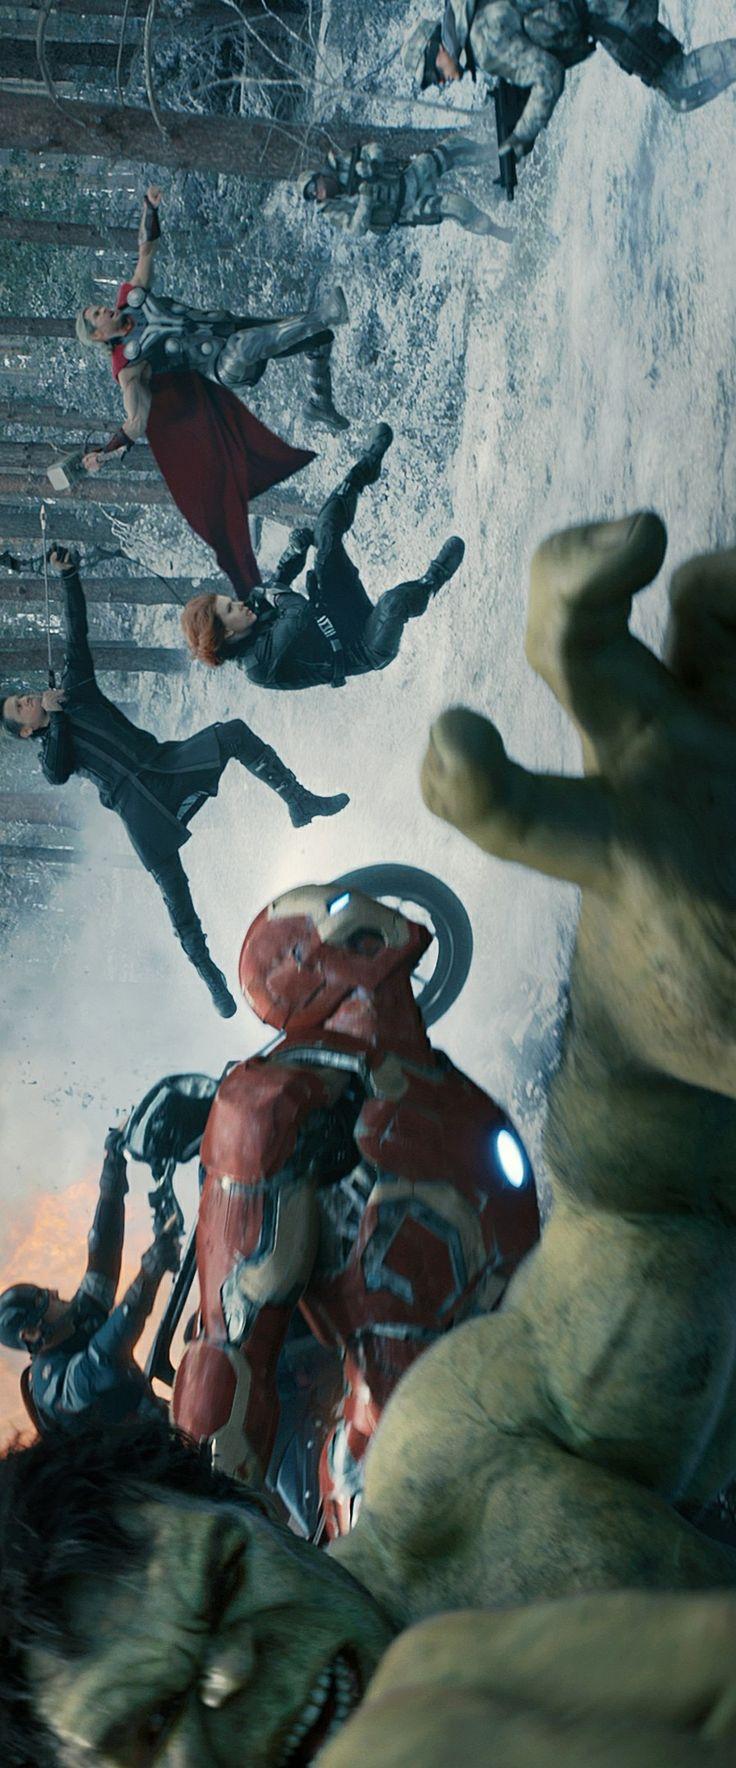 Bruce Banner, Tony Stark, Steve Rogers, Thor, Natasha Romanoff, Clint Barton    Avengers: Age of Ultron